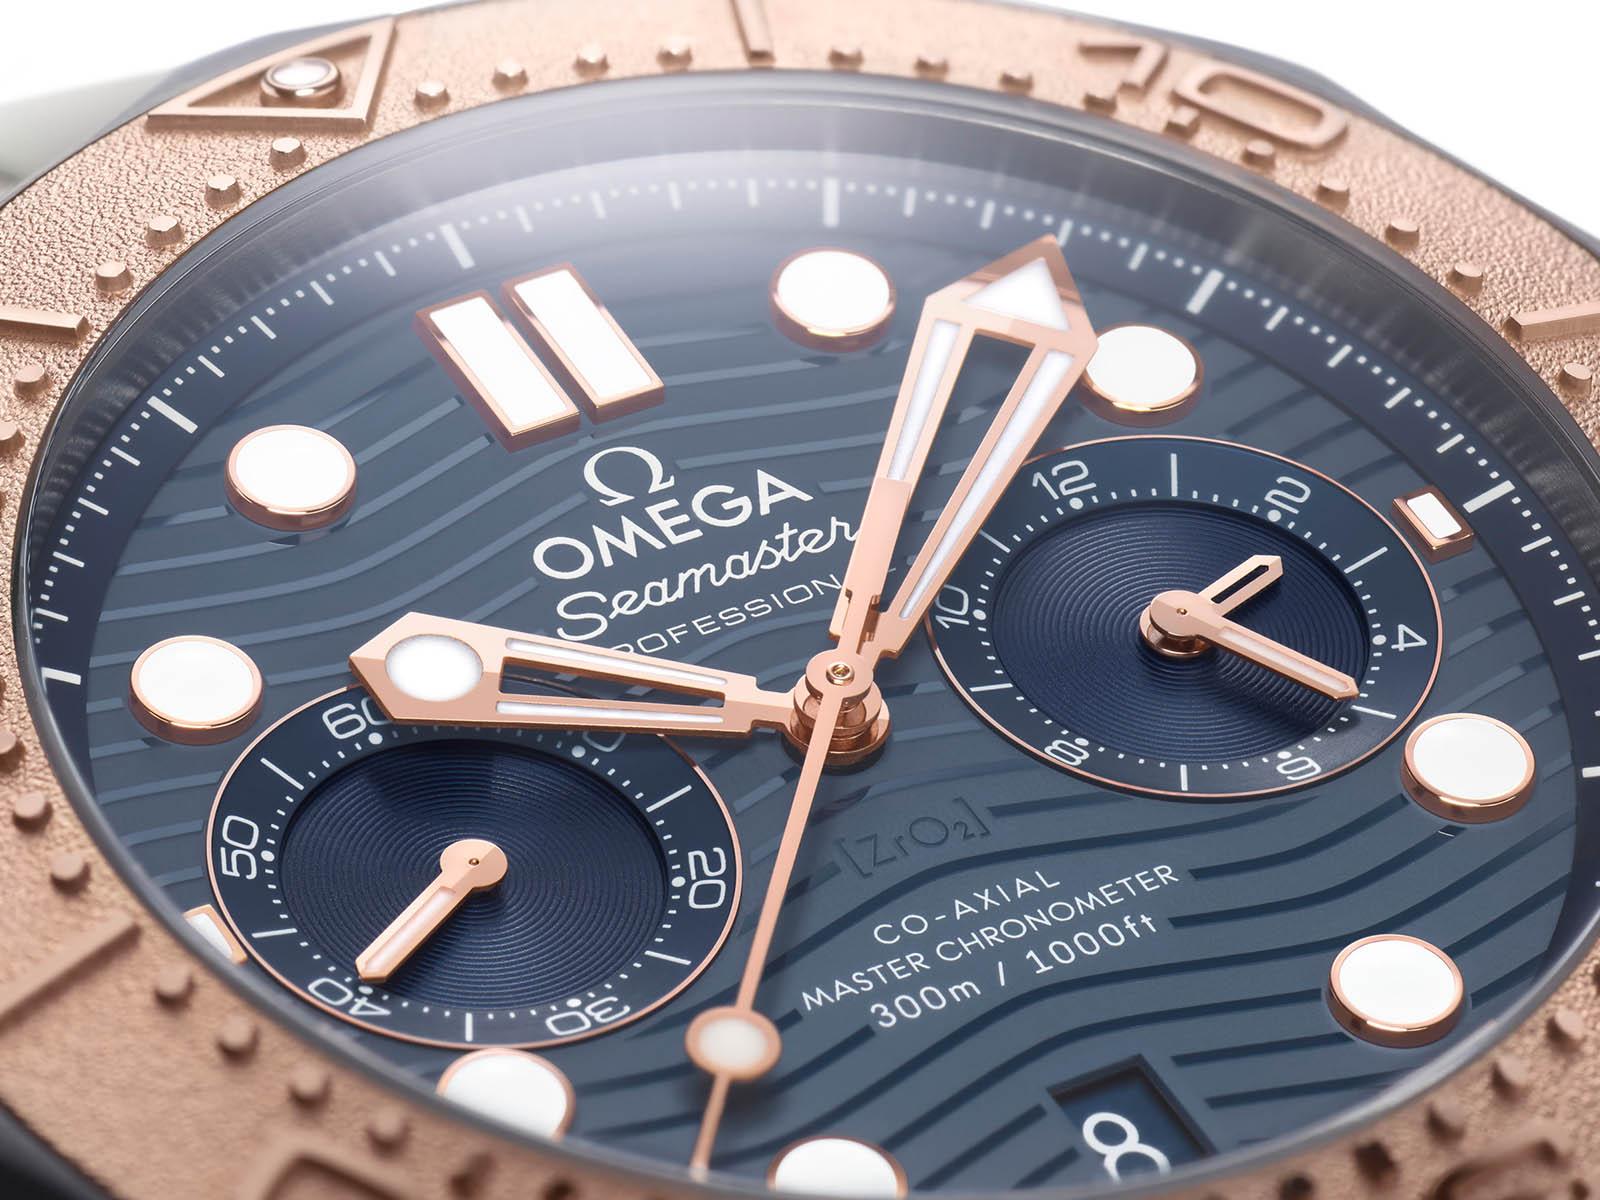 omega-seamaster-diver-300m-chronograph-gold-titanium-tantalum-3.jpg